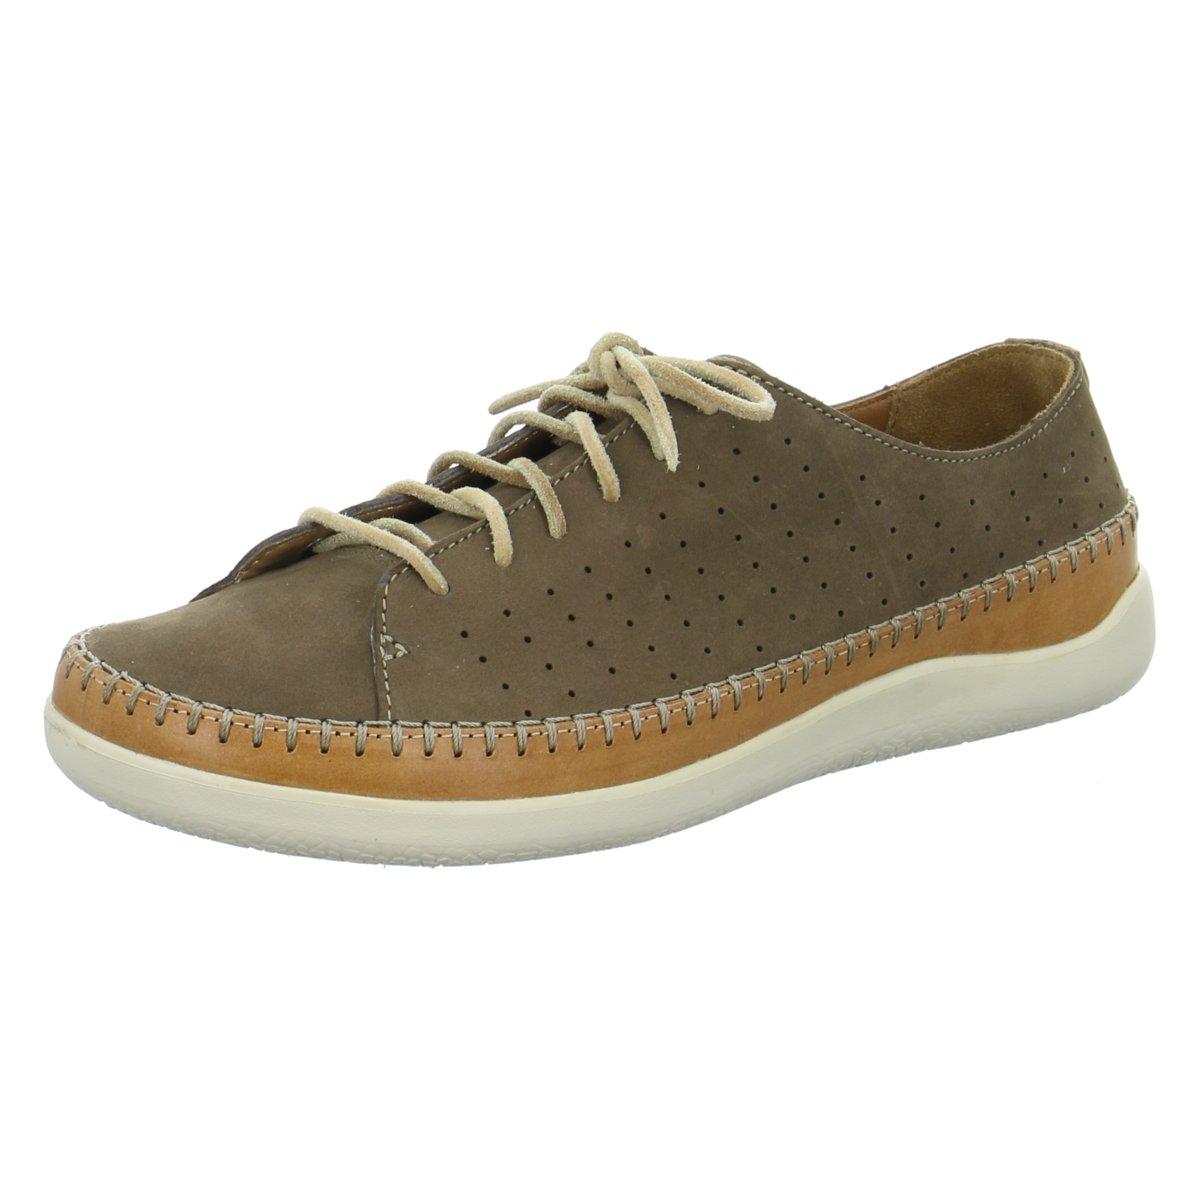 NEU Clarks Herren Schnuerschuhe Veho Edge Herren Halbschuhe/Sneaker 261238827